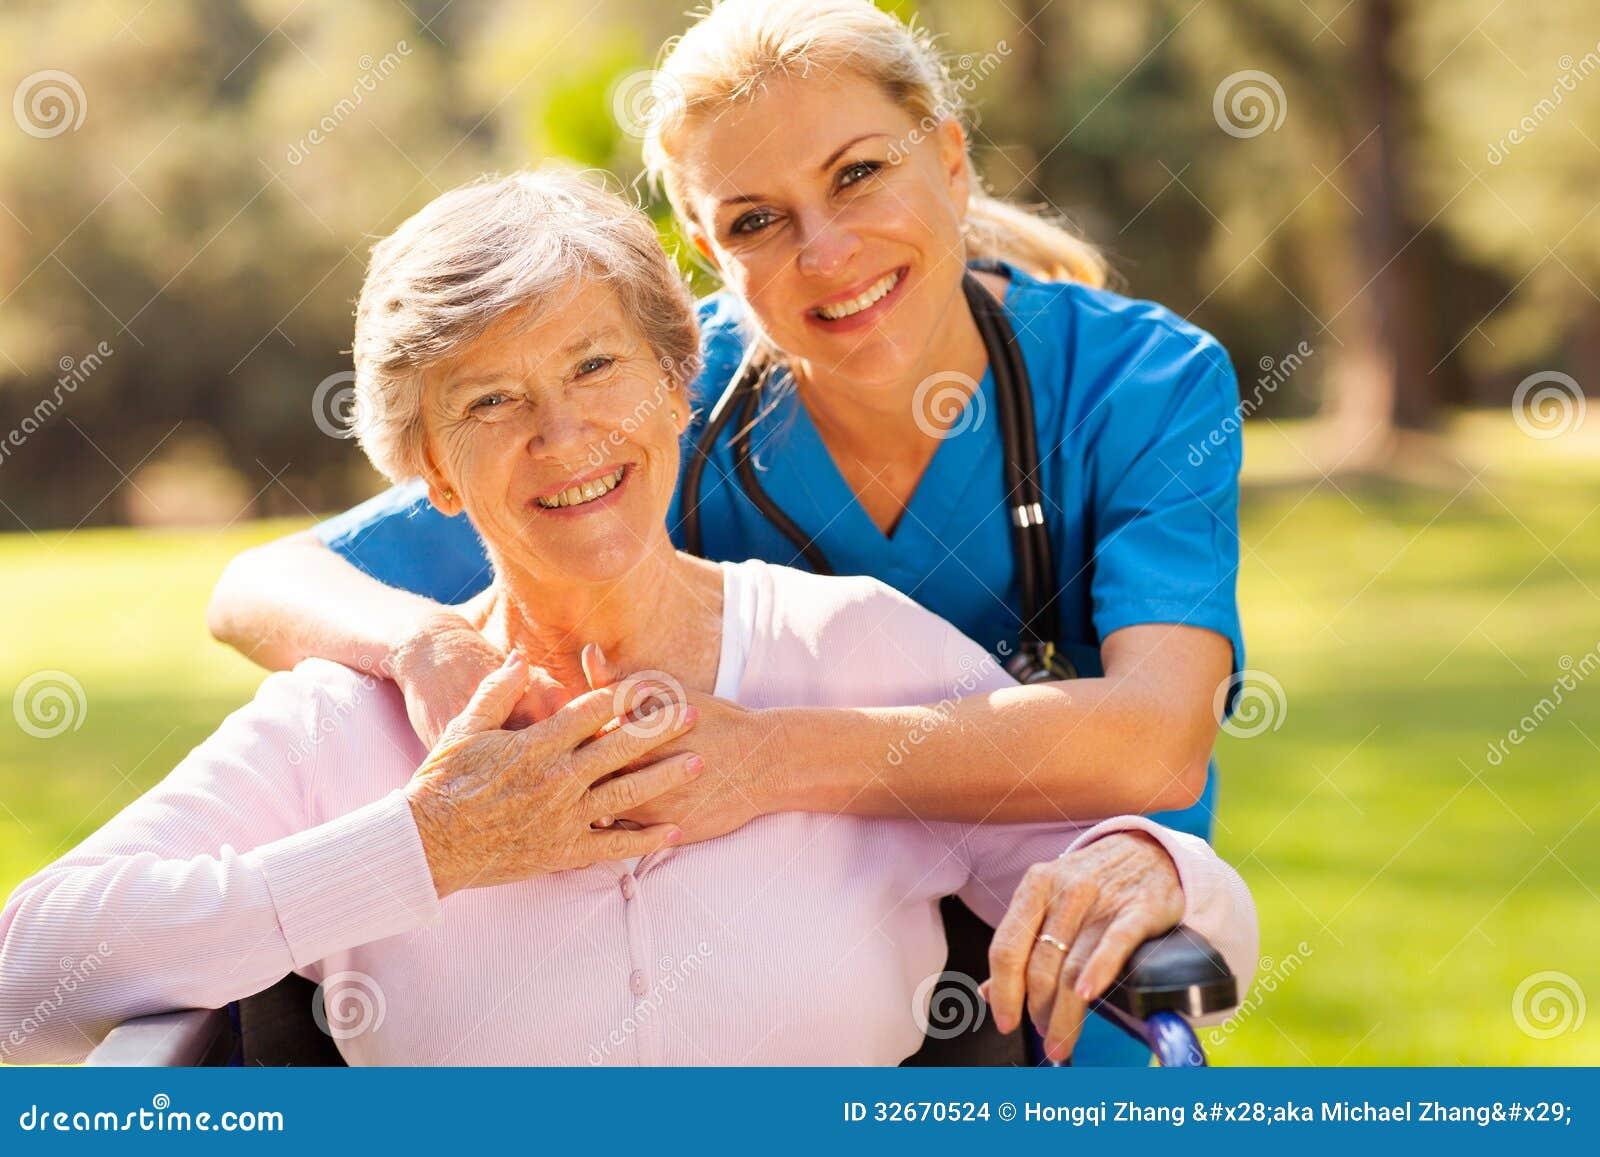 Senior woman caregiver